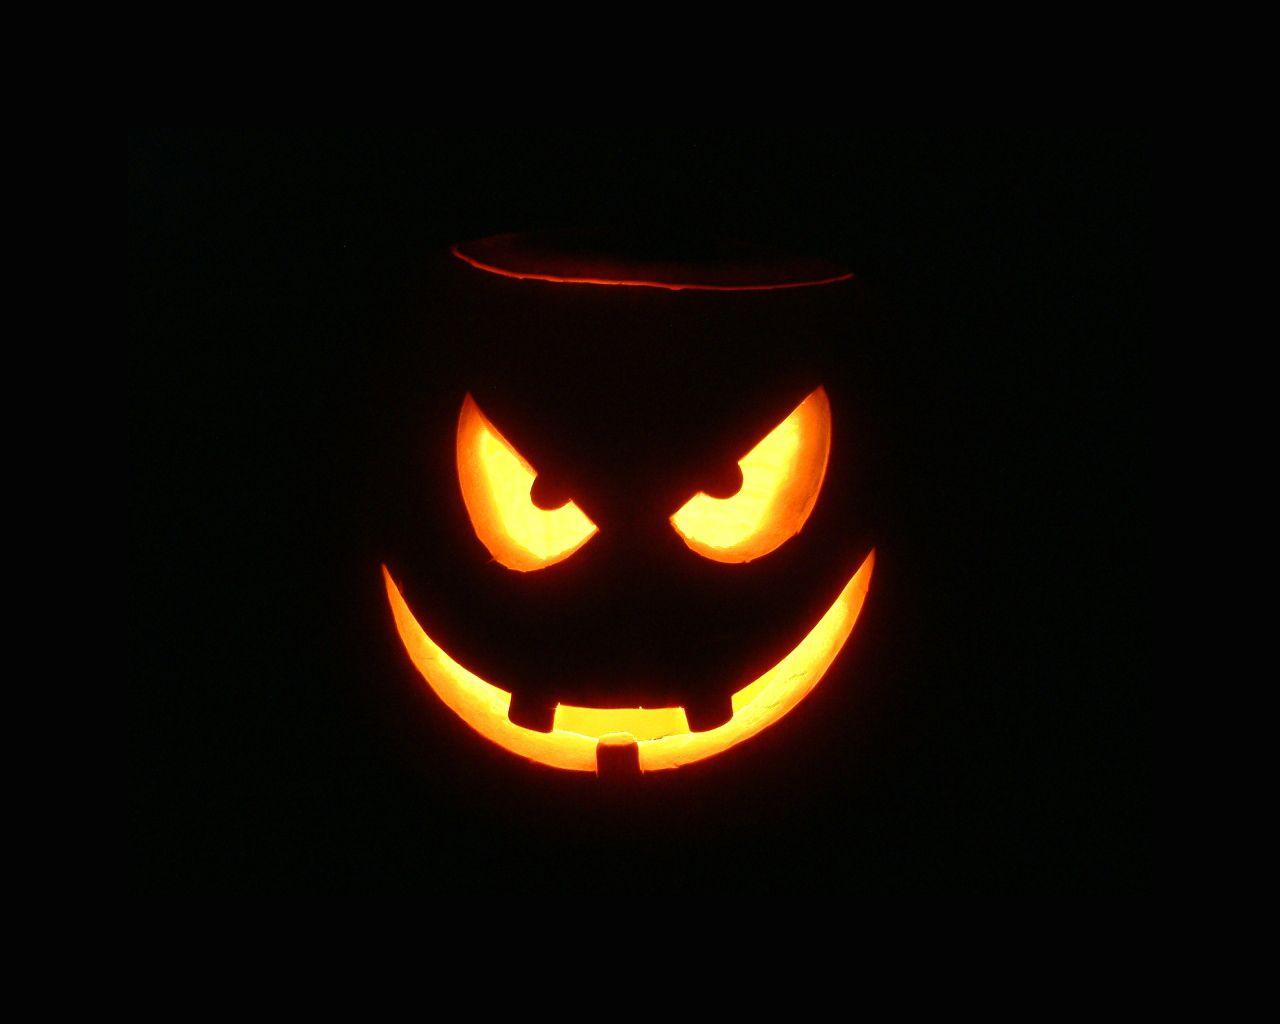 Simple Wallpaper Halloween Facebook - 00bc4a9996197839c34a58b1c93b7d8d  Image_47388.jpg